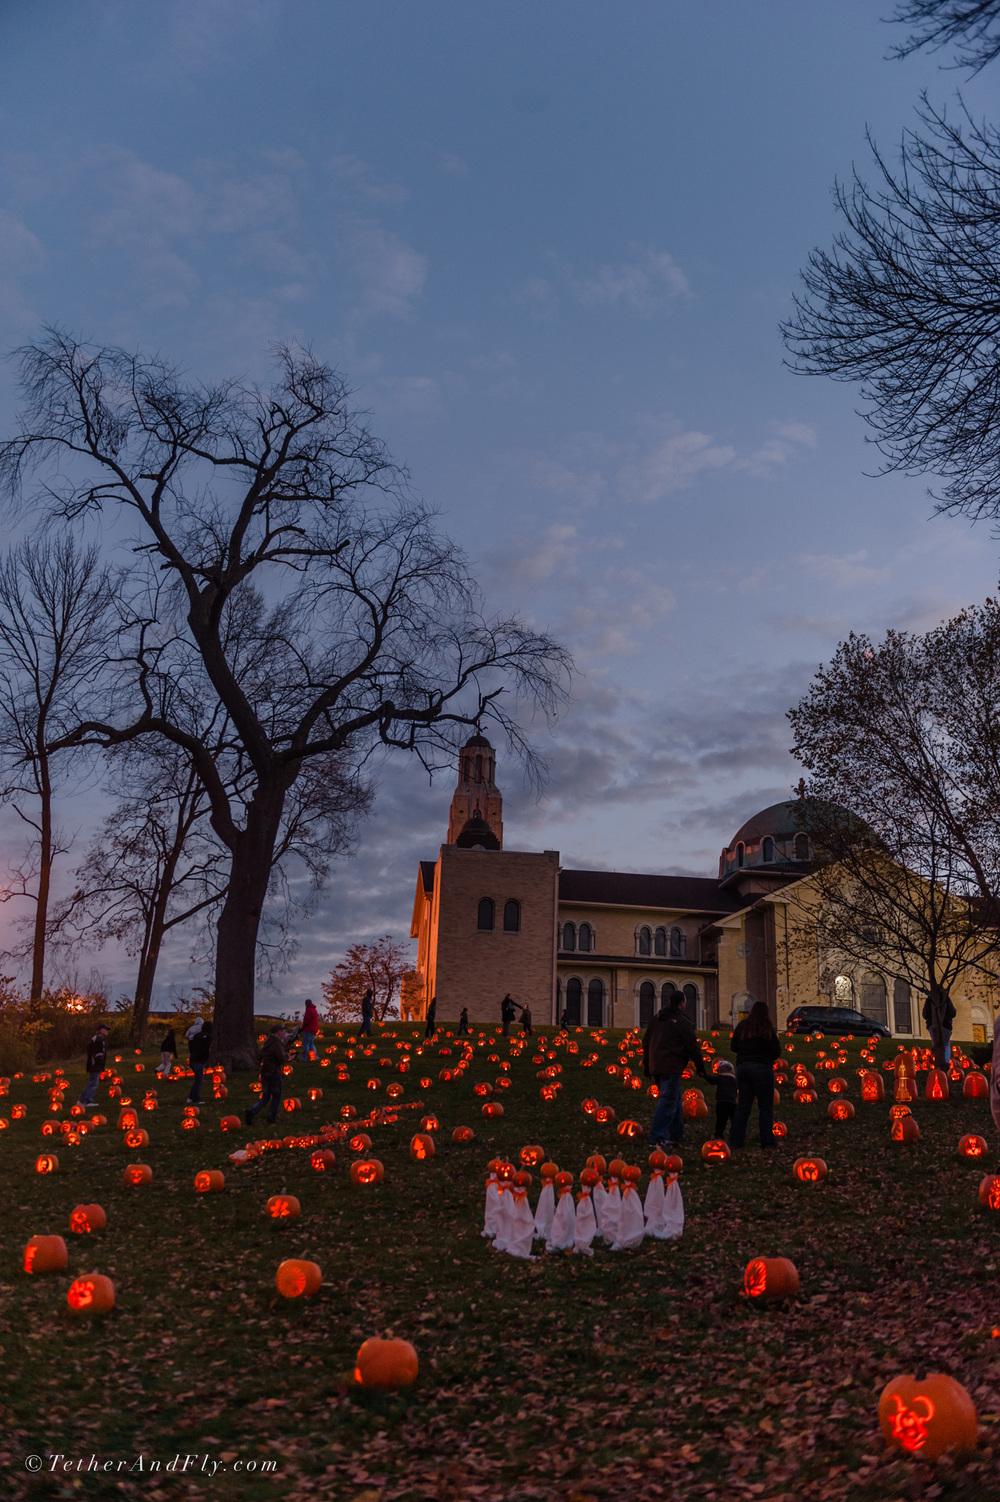 Stoddard Ave Pumpkin Glow | Dayton, OH | TetherAndFly.com